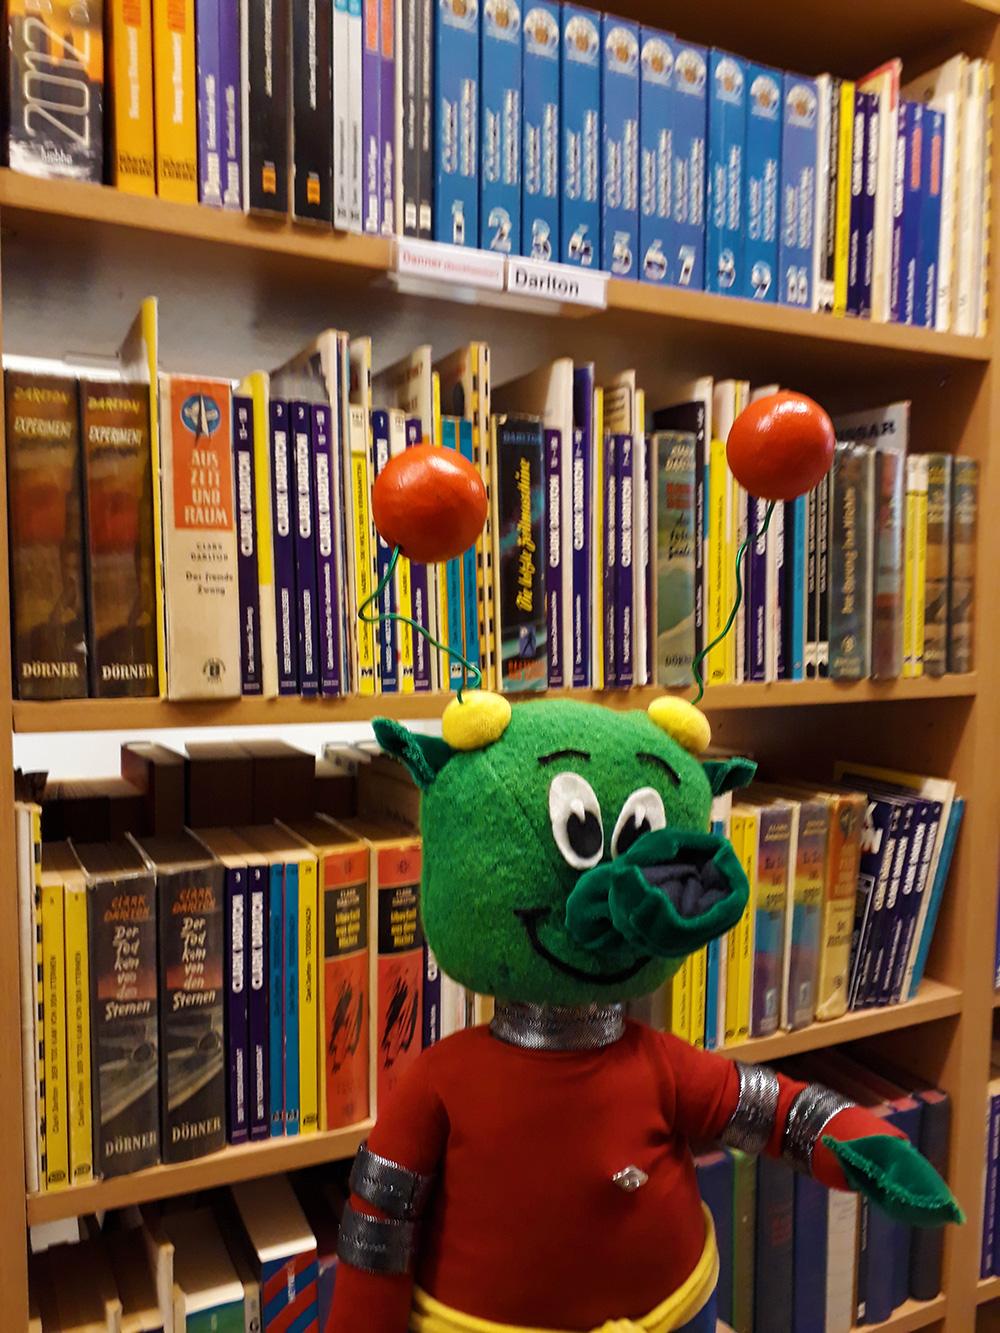 Der Rüsselmops i.d. Bibliothek